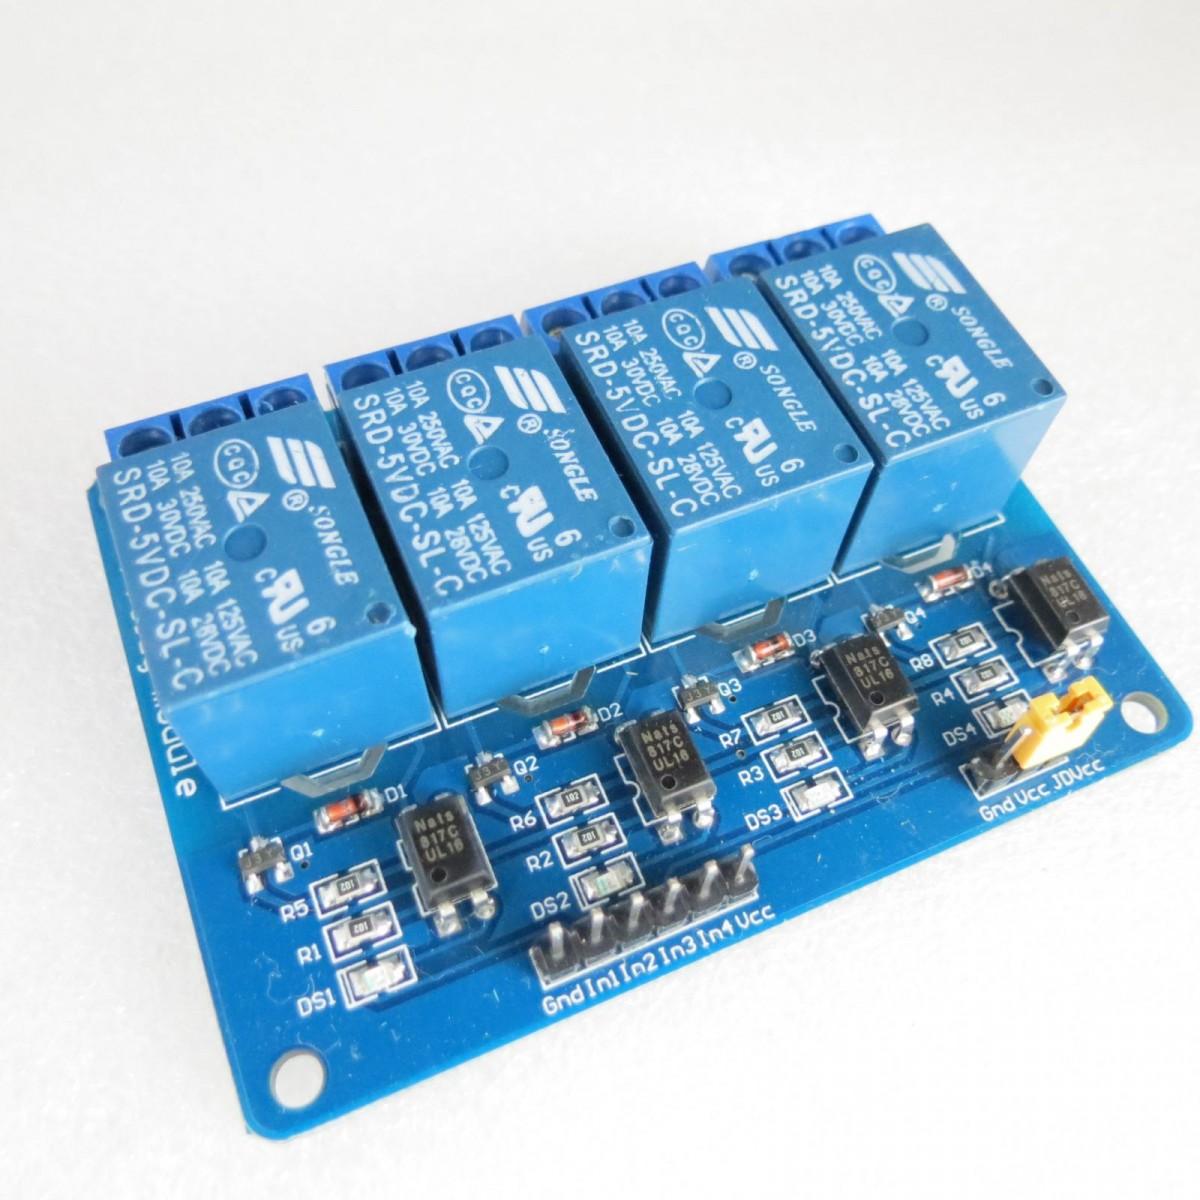 Релейный модуль с опторазвязкой 4 реле 5V